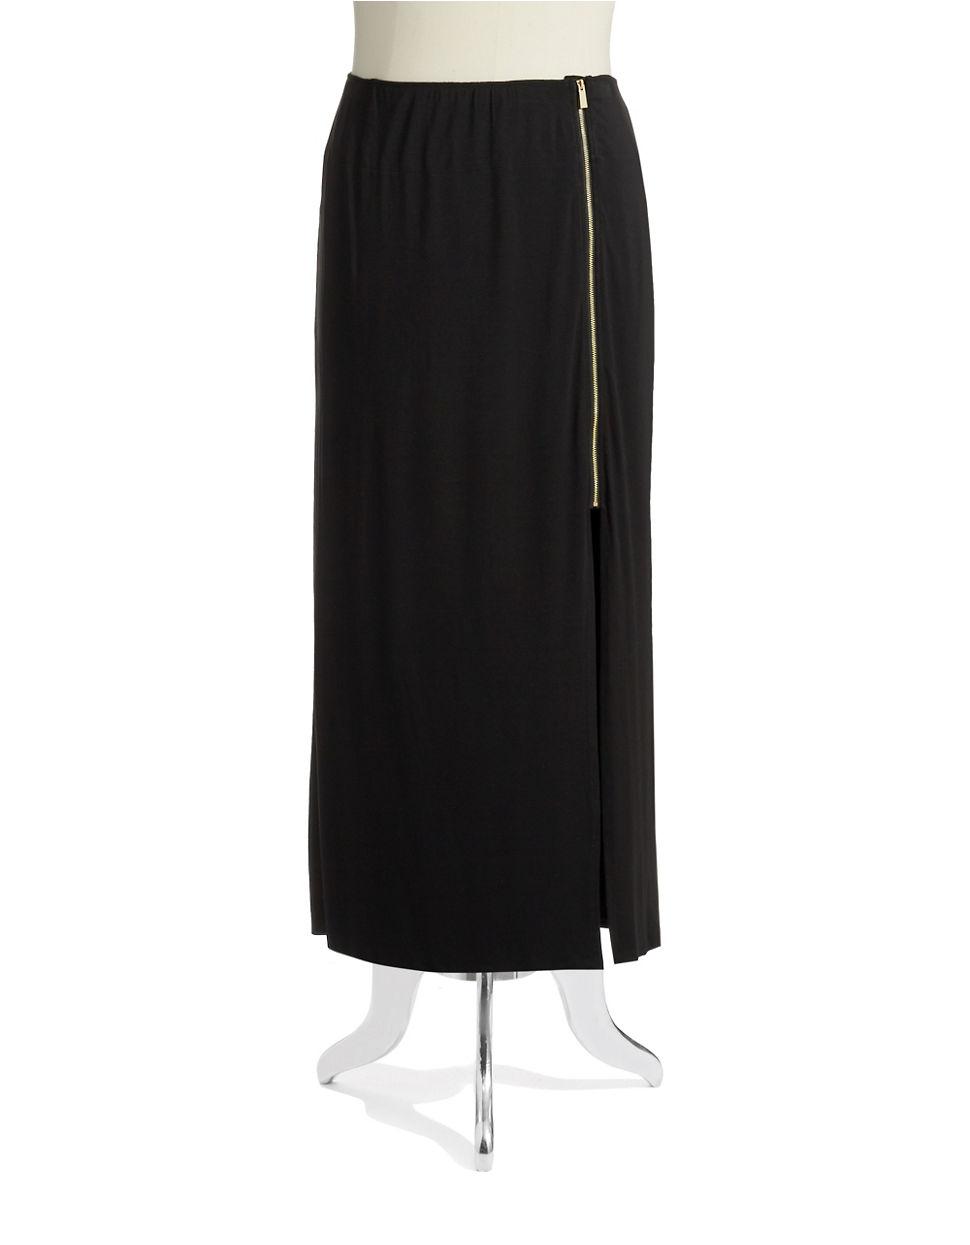 vince camuto side zipper maxi skirt in black rich black